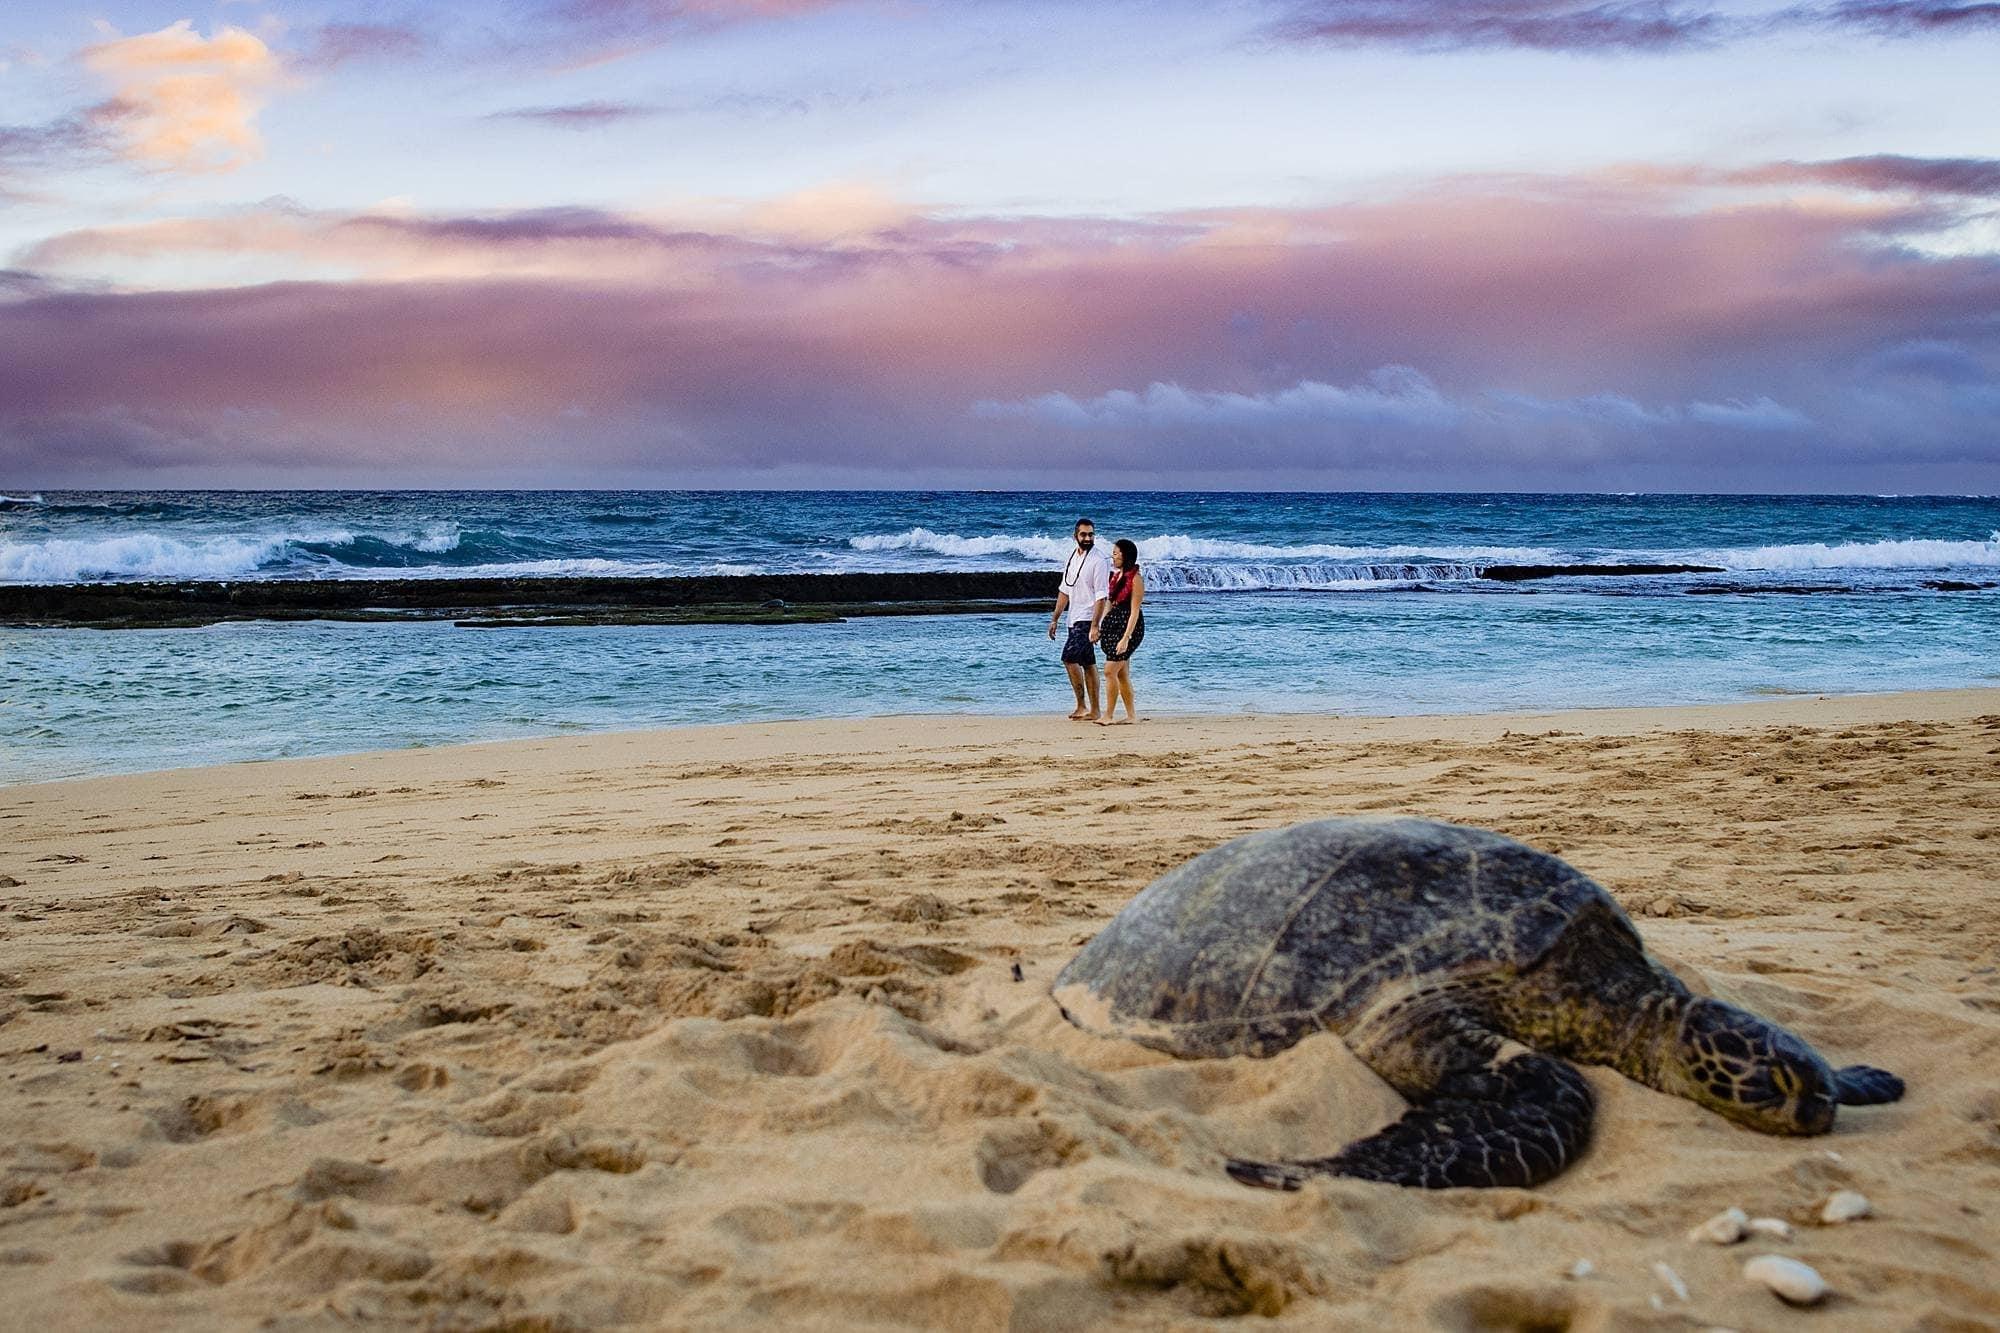 sunset portraits in Maui, hawaii